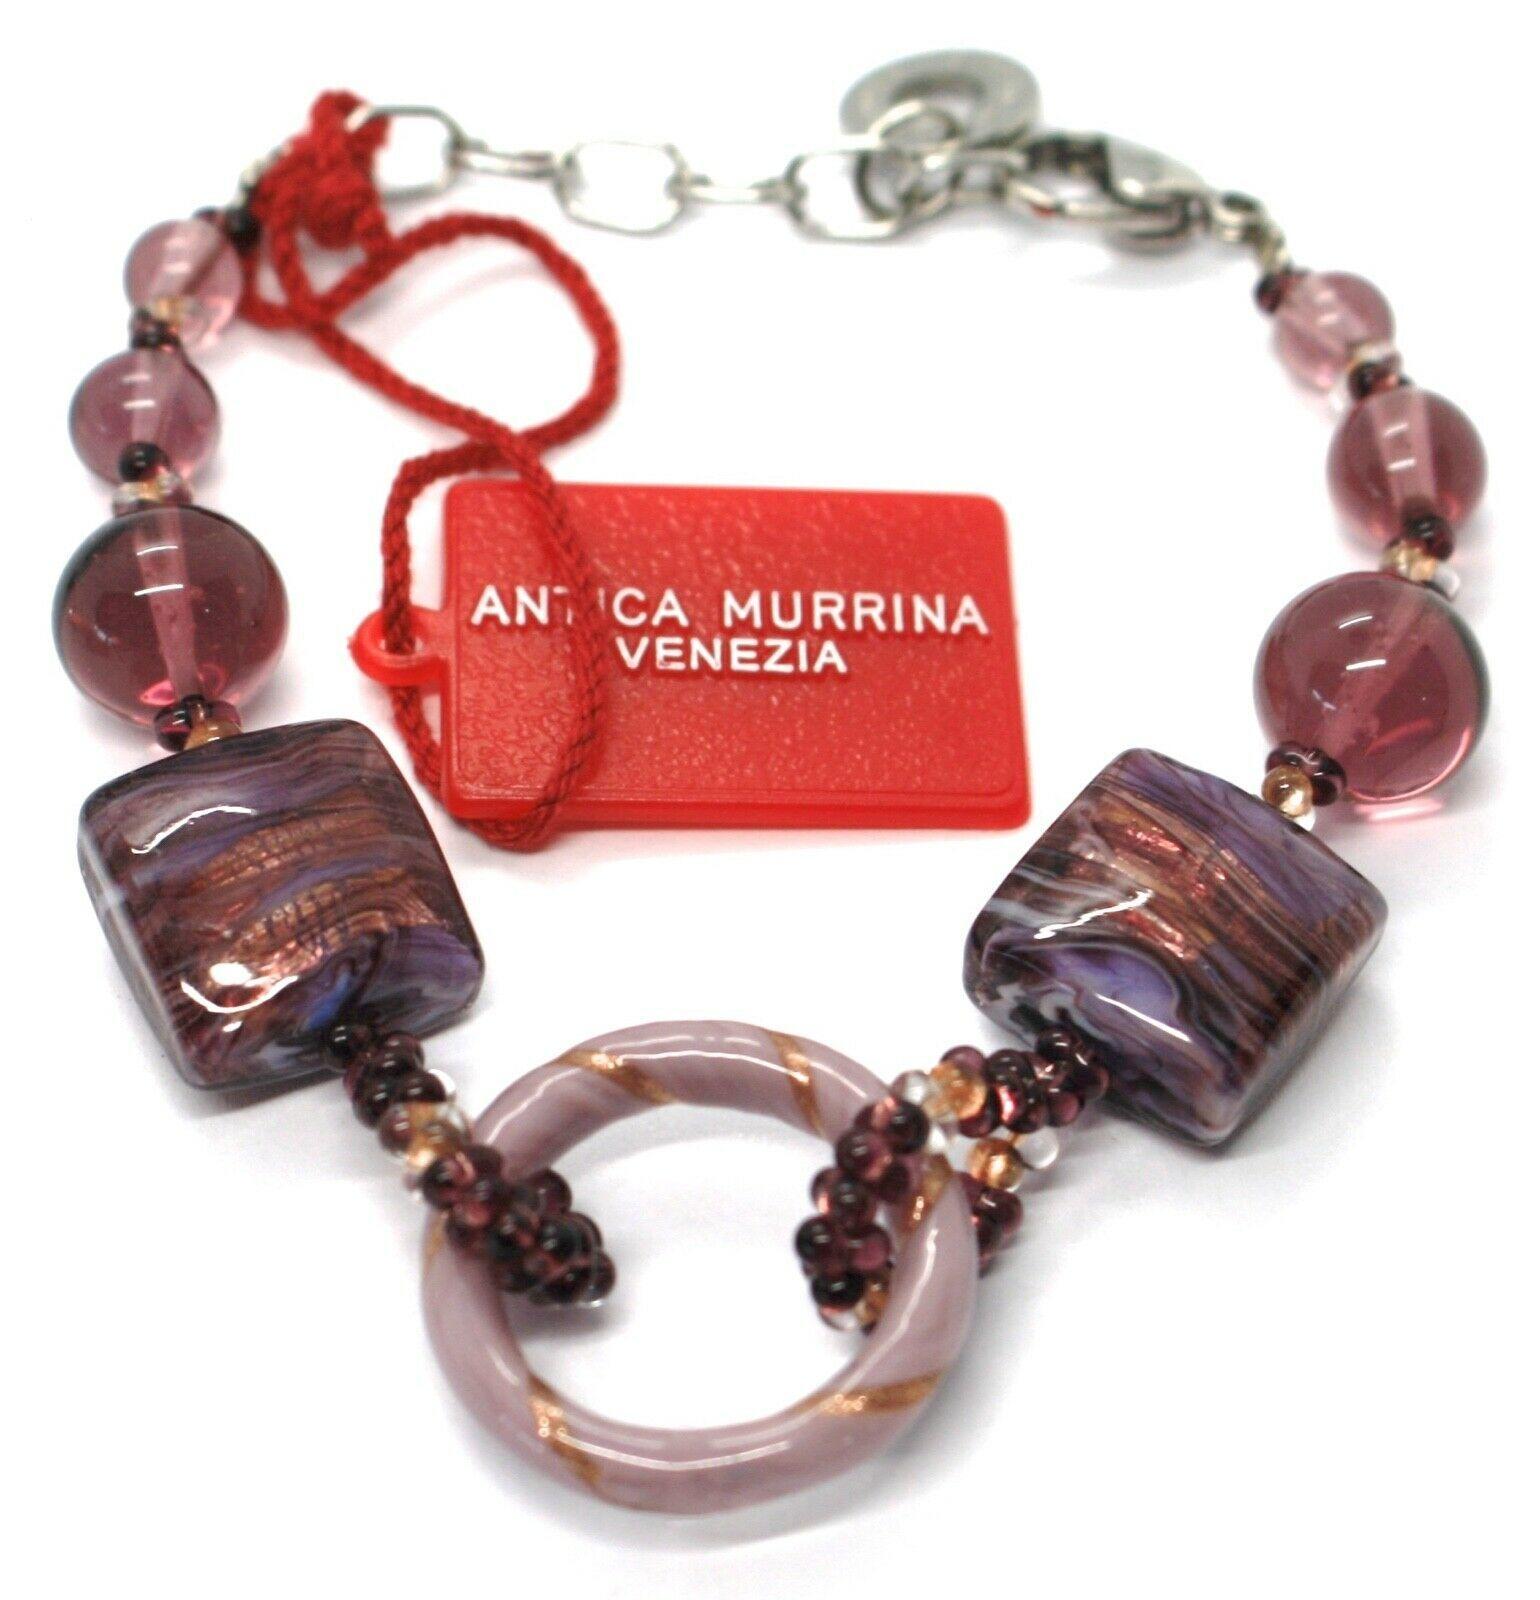 Bracelet Antica Murrina Venezia,BR567A05,Purple, Circle,Squares,Spheres